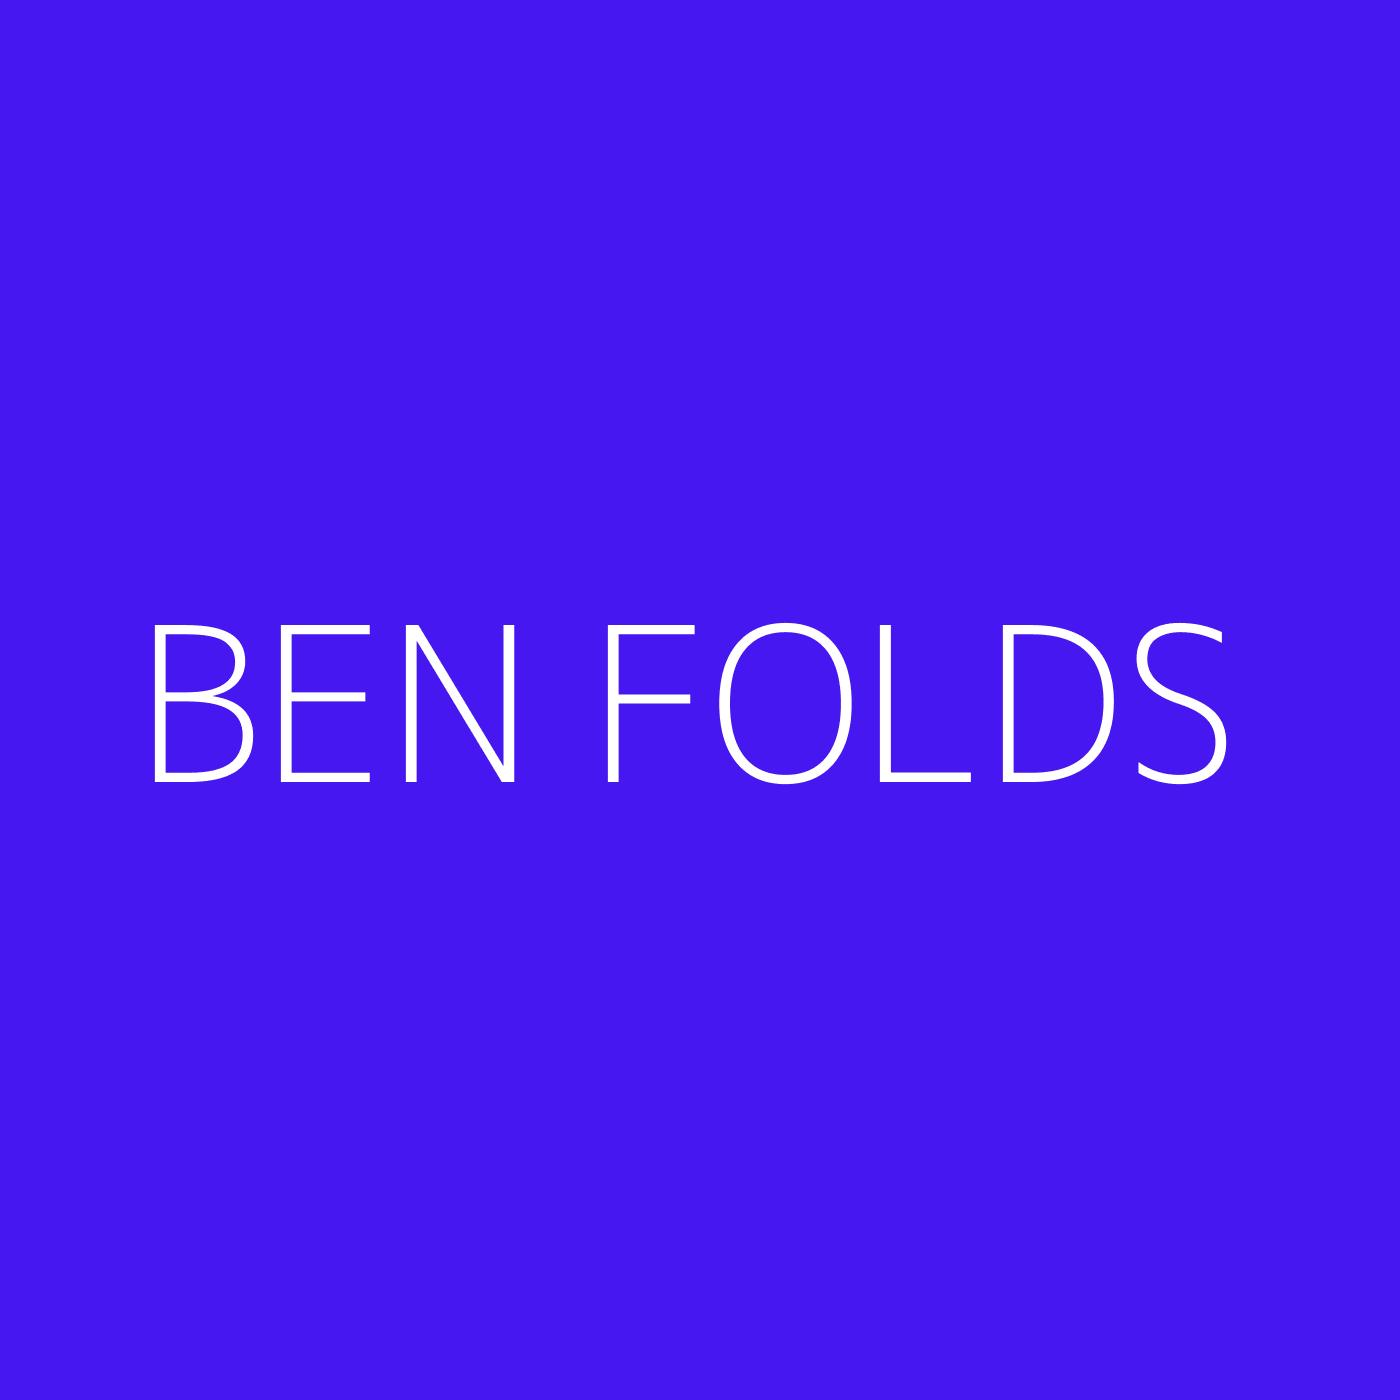 Ben Folds Playlist Artwork